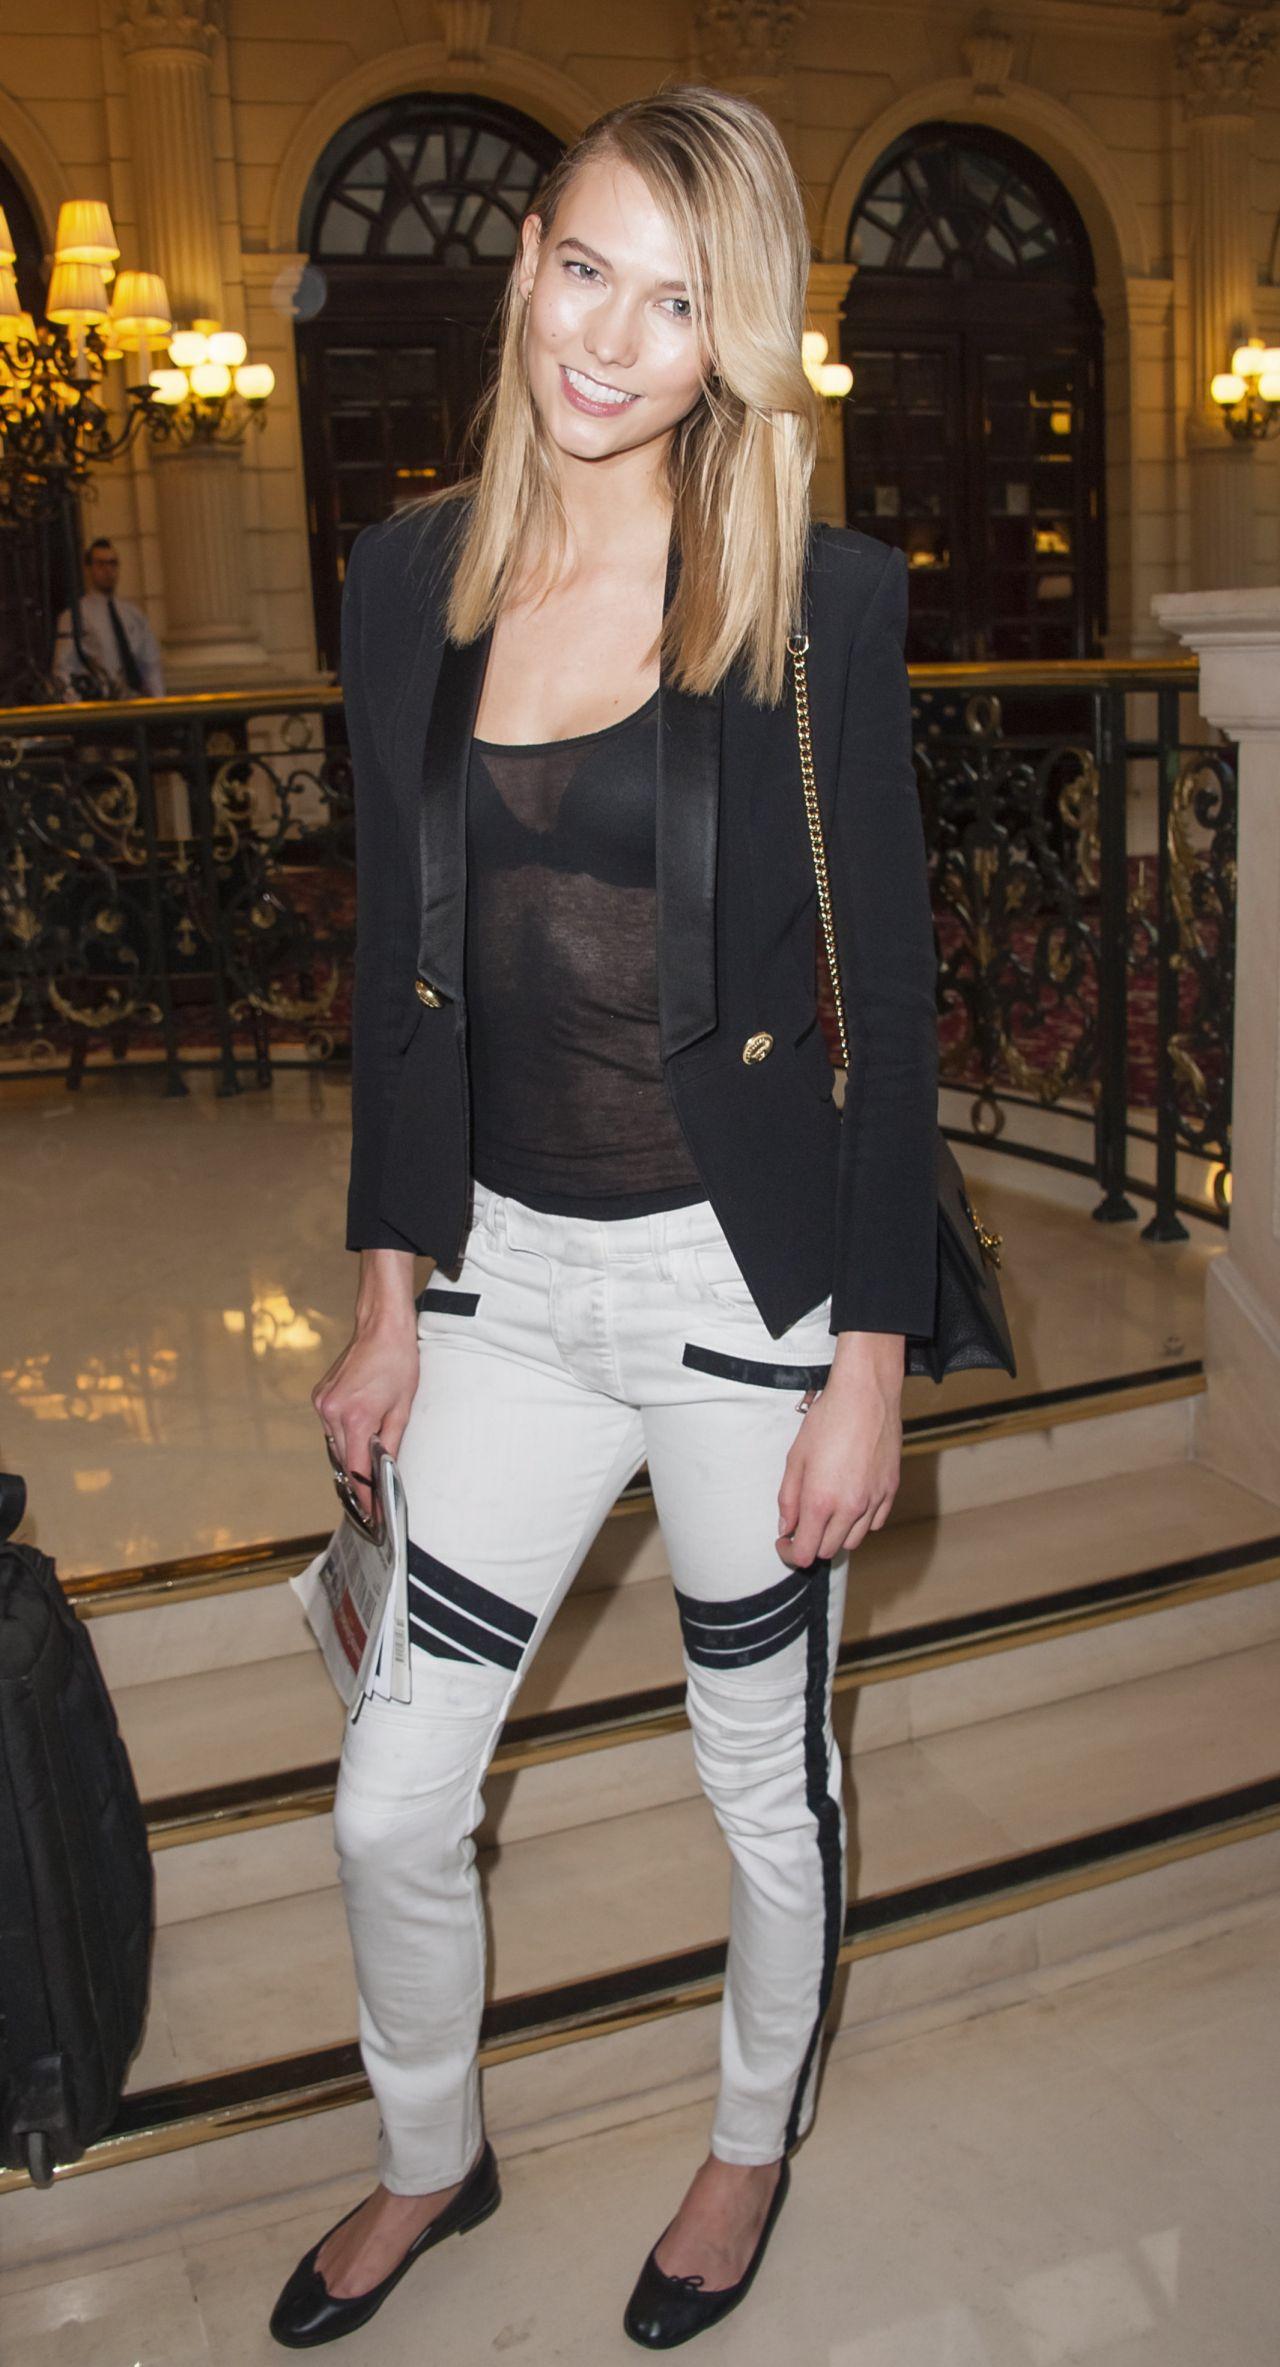 karlie-kloss-casual-outfit-balmain-fashion-show-in-paris-march-2015_1